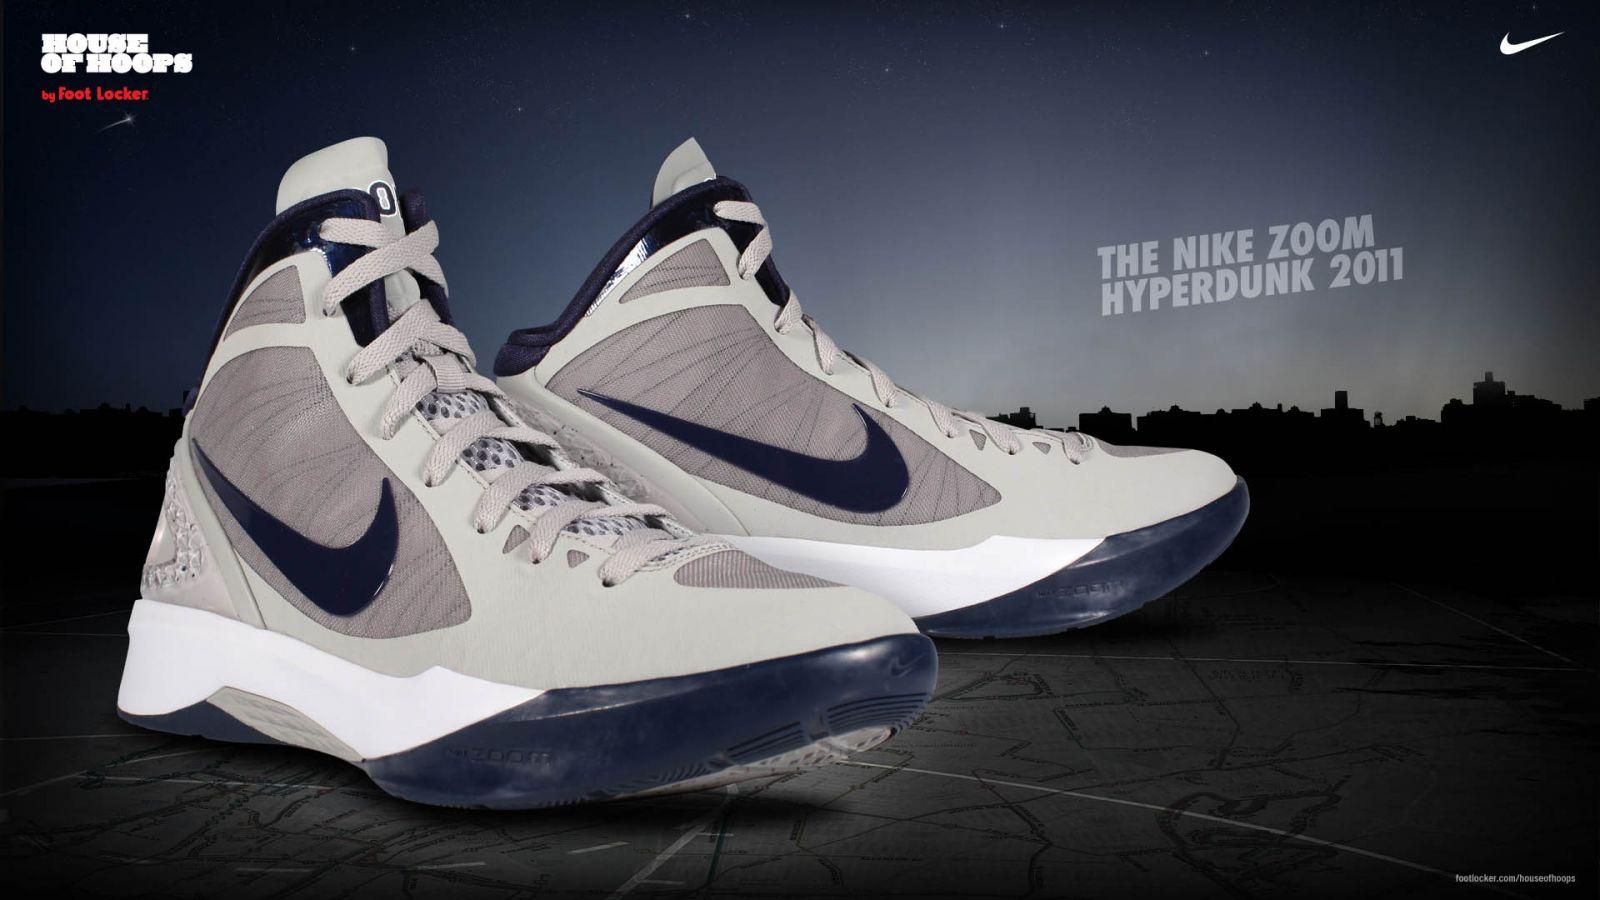 buy online 616c9 a5a0c Nike Zoom Hyperdunk 2011 - 5 Boroughs Pack -